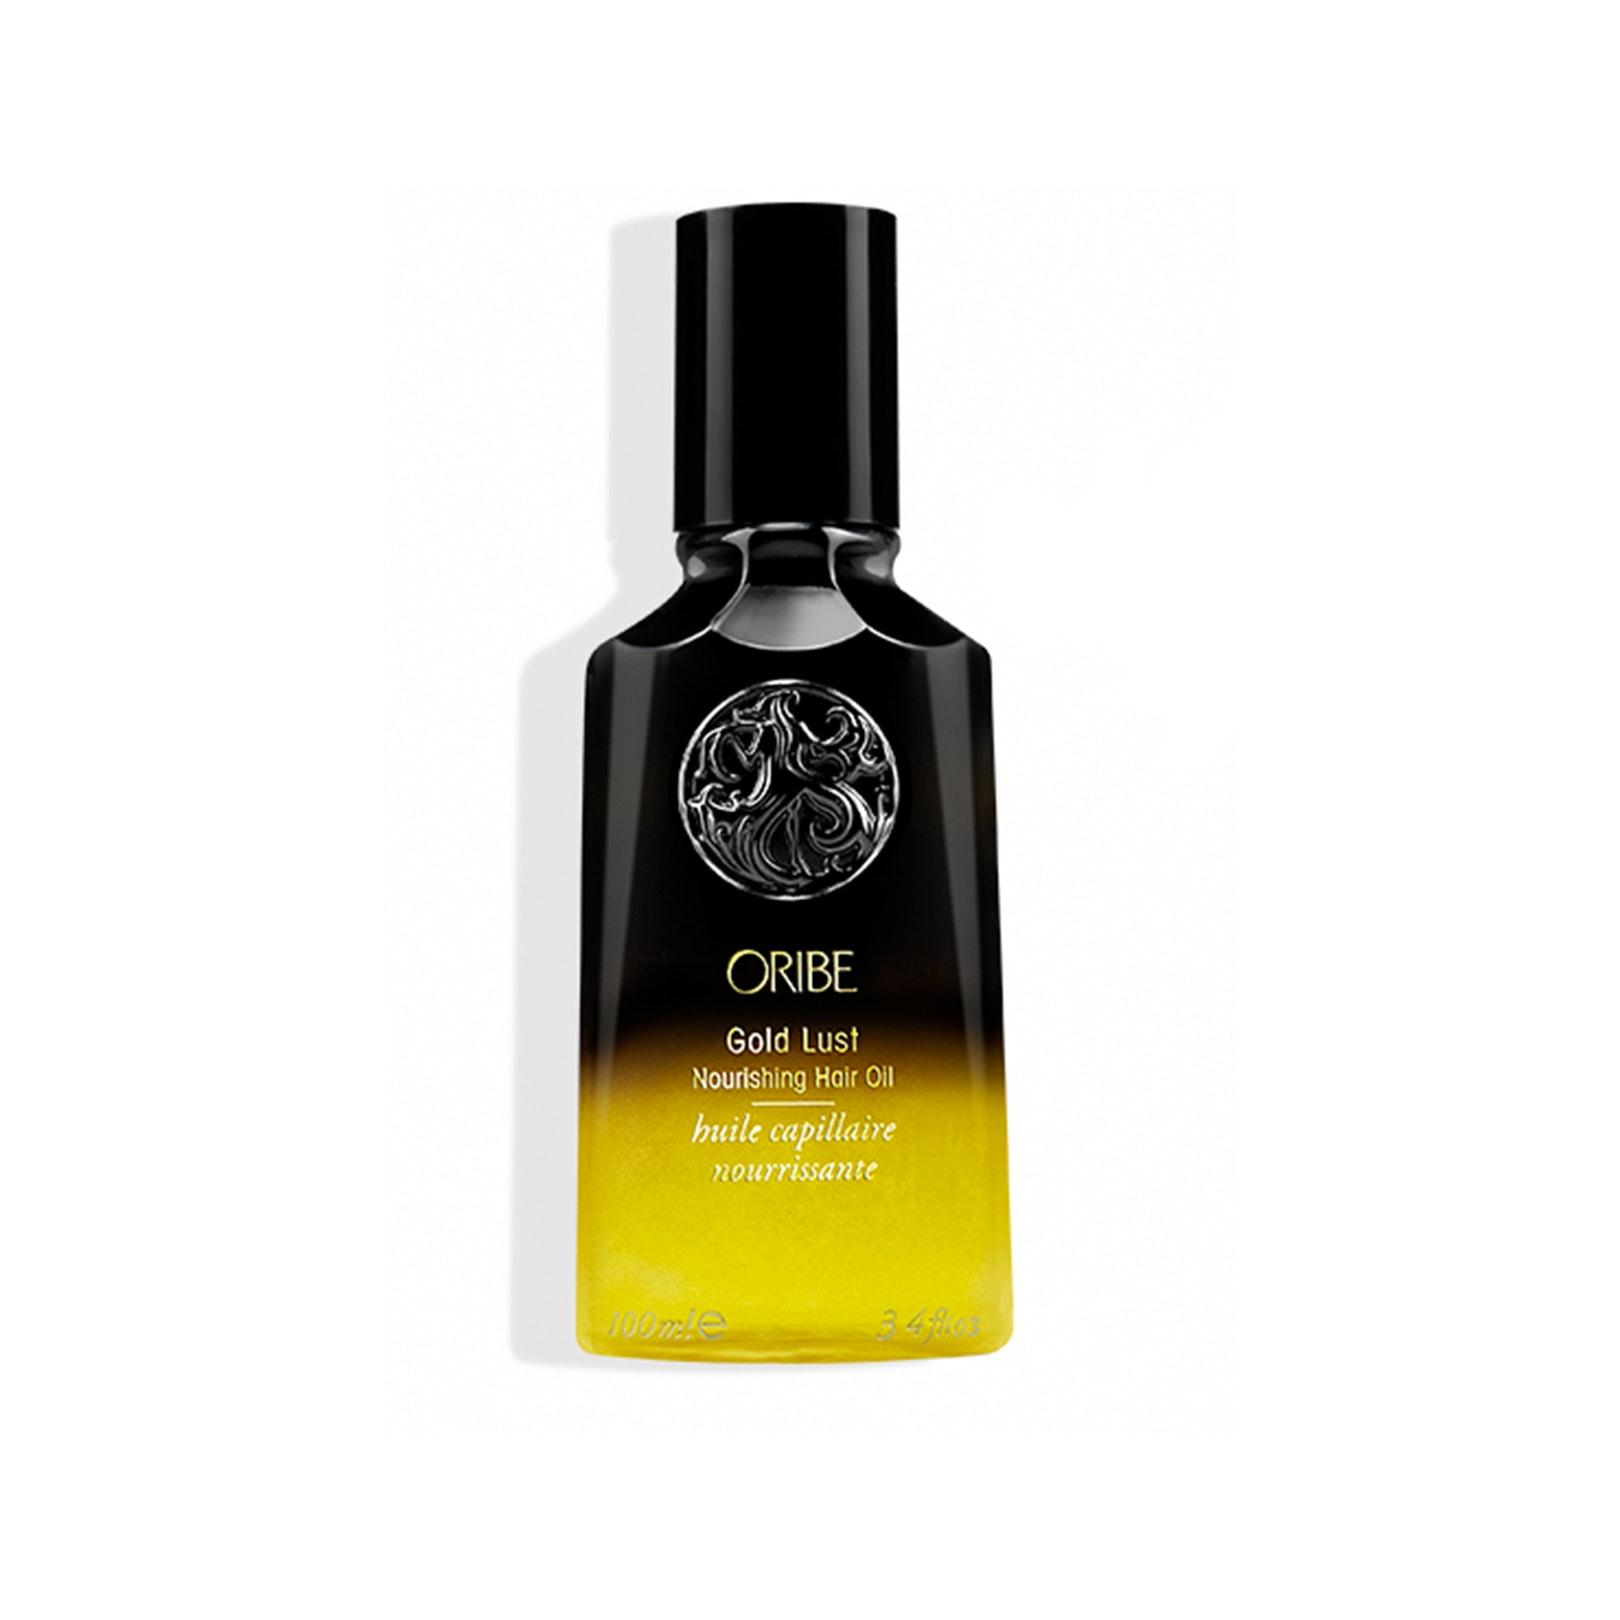 Oribe Gold Lust Nourishing